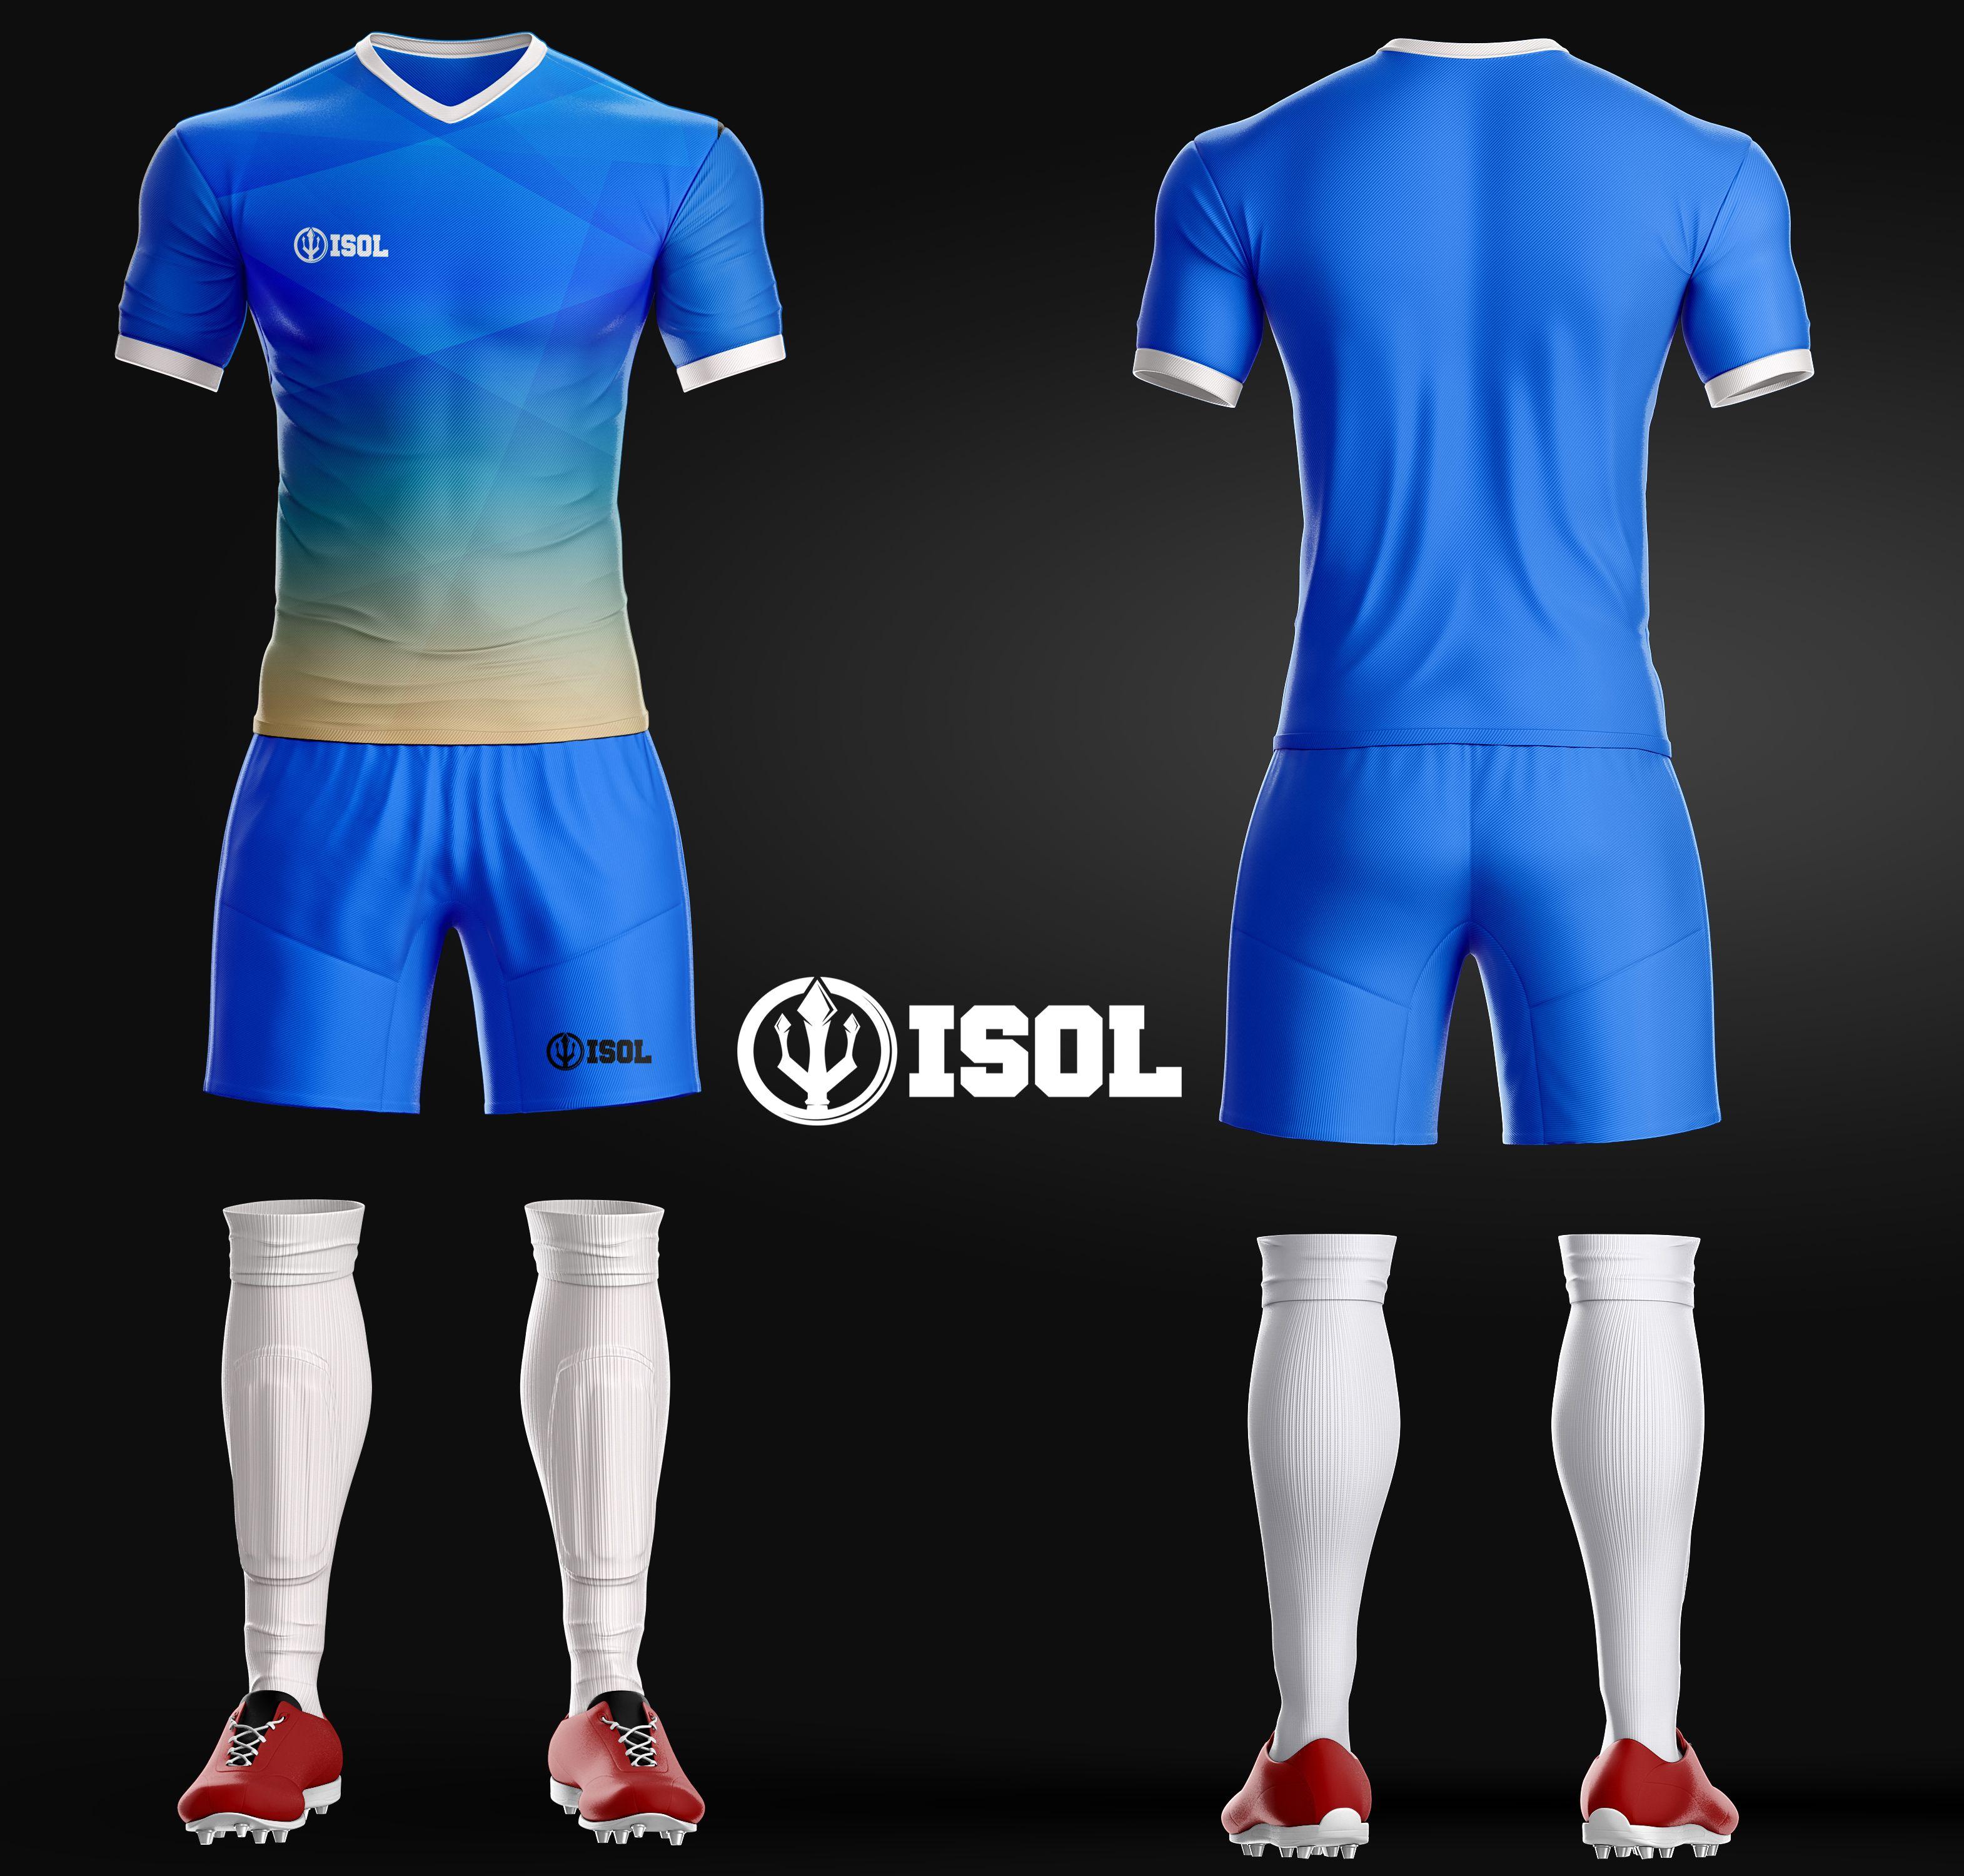 Custom Jersey Futsal Keren Polos Dan Printing Sepak Bola Sepatu Sepakbola Desain